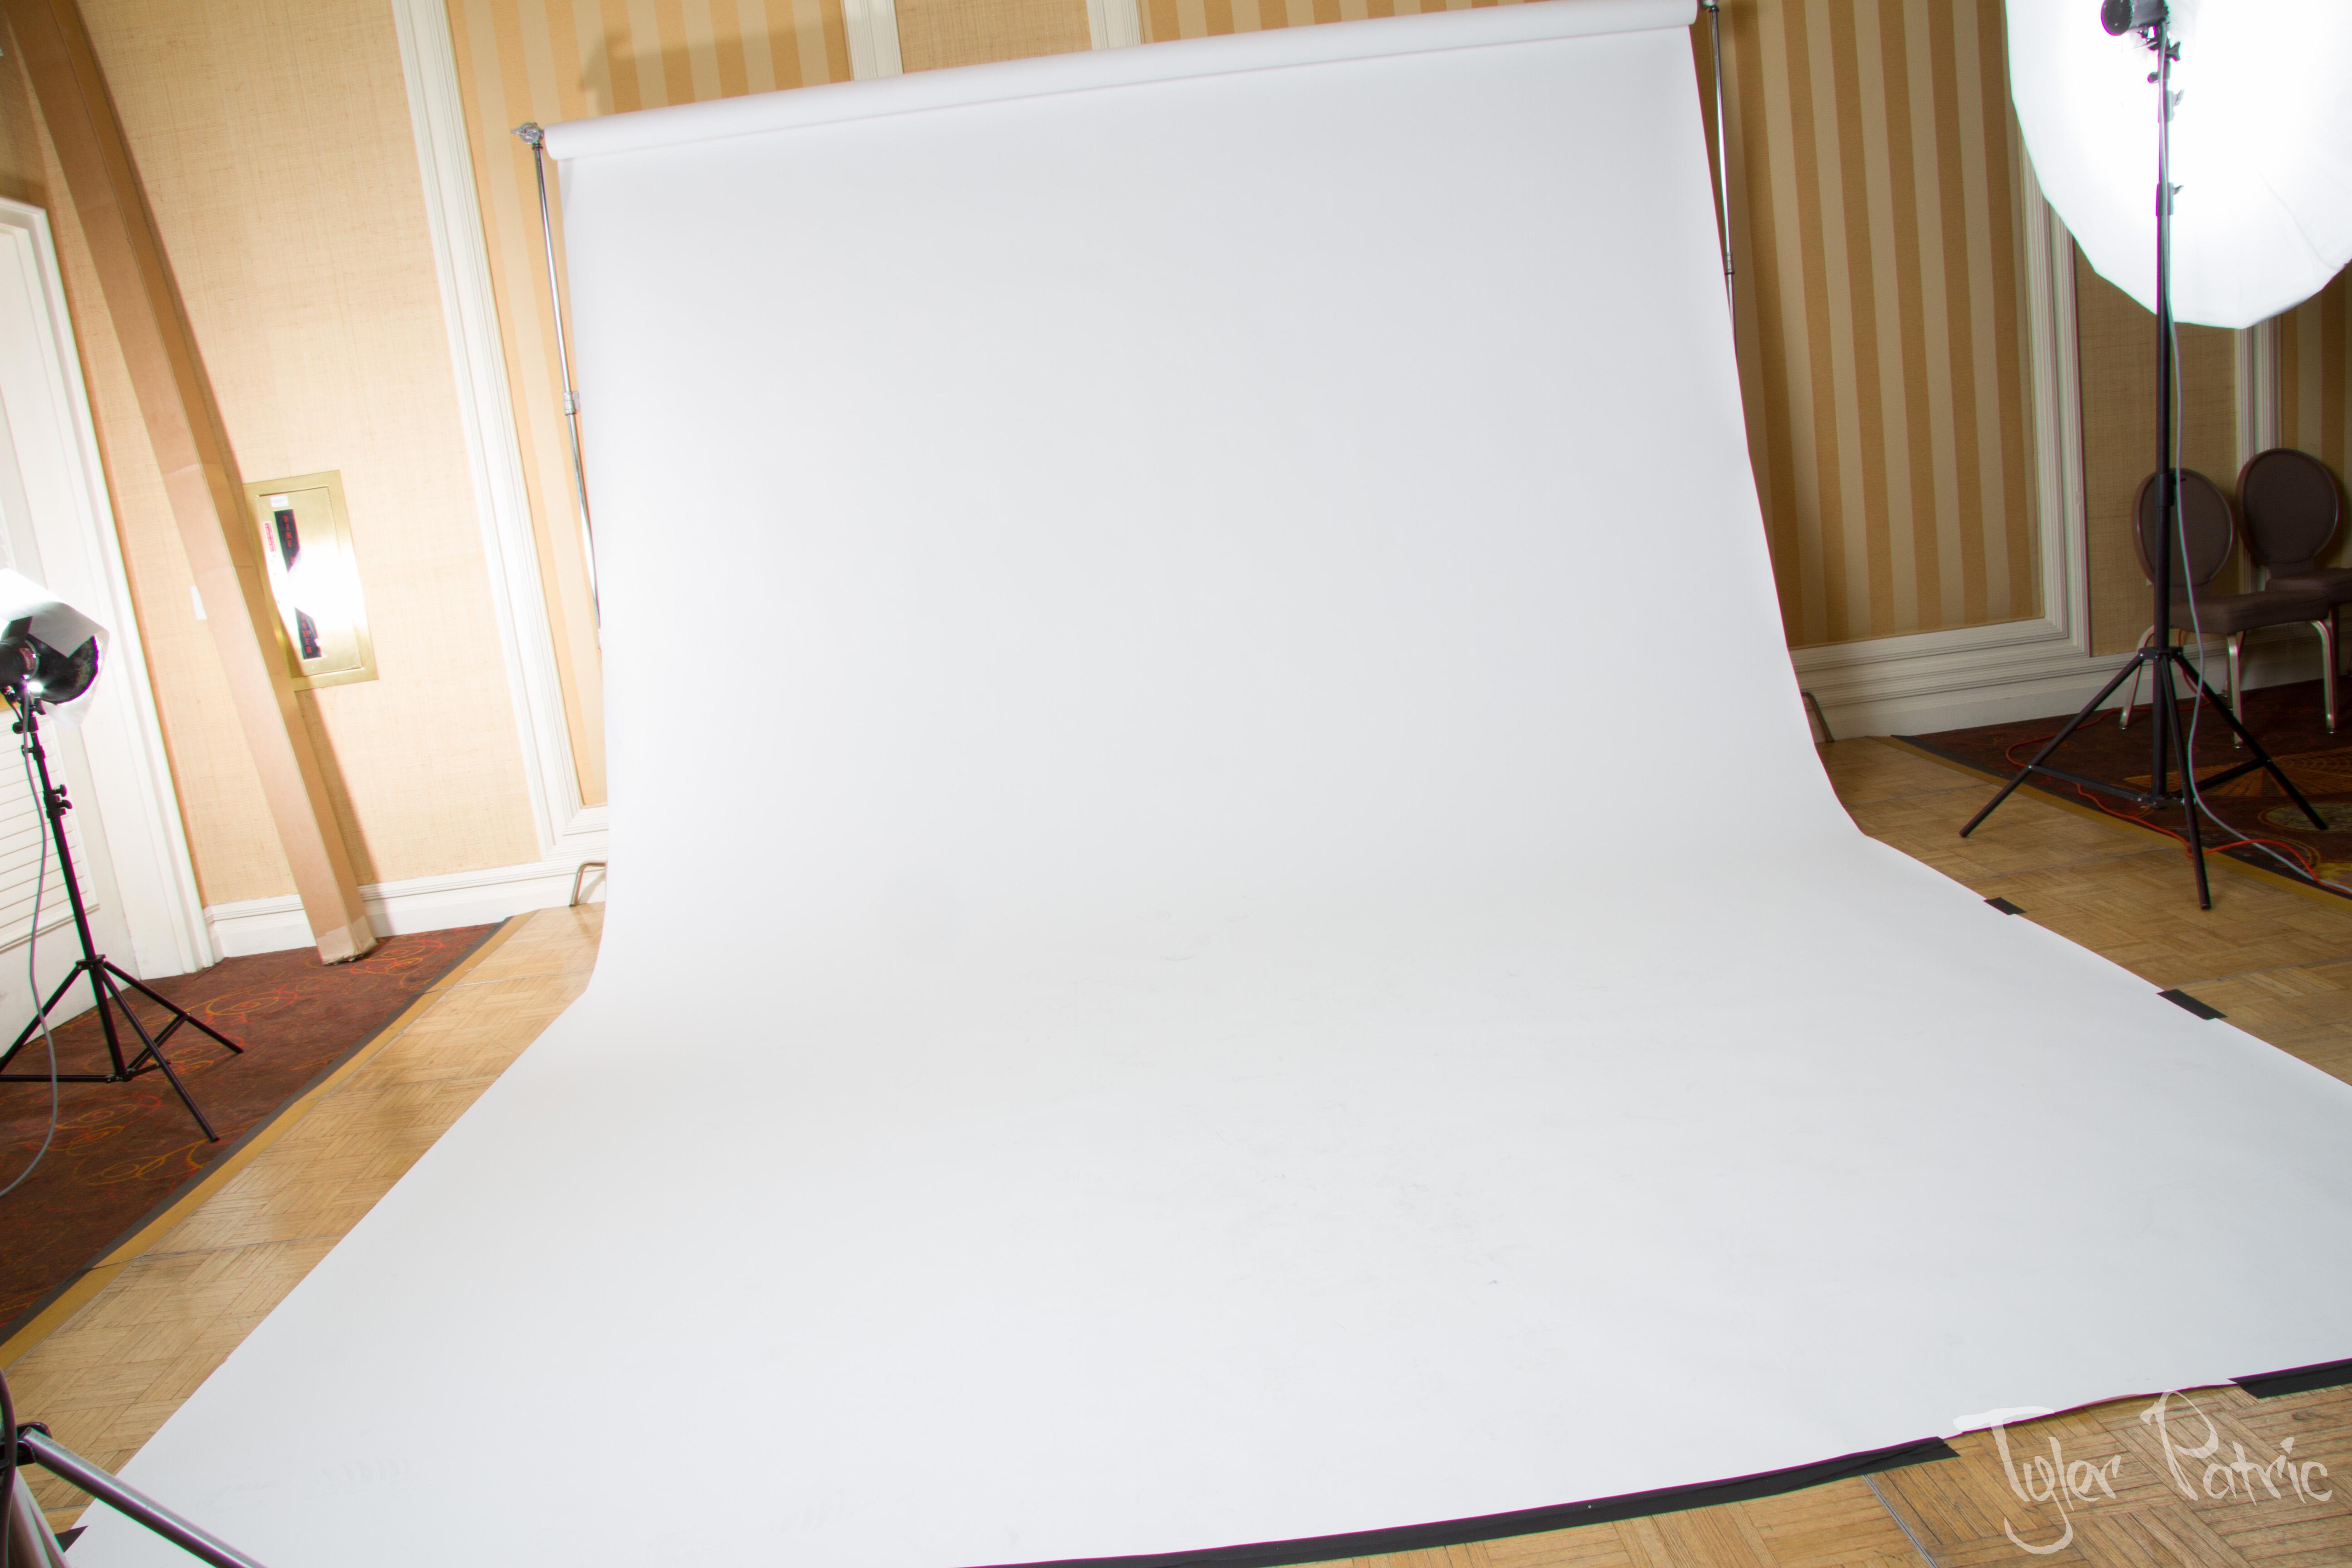 camera+Gear-TP-TP-11.jpg